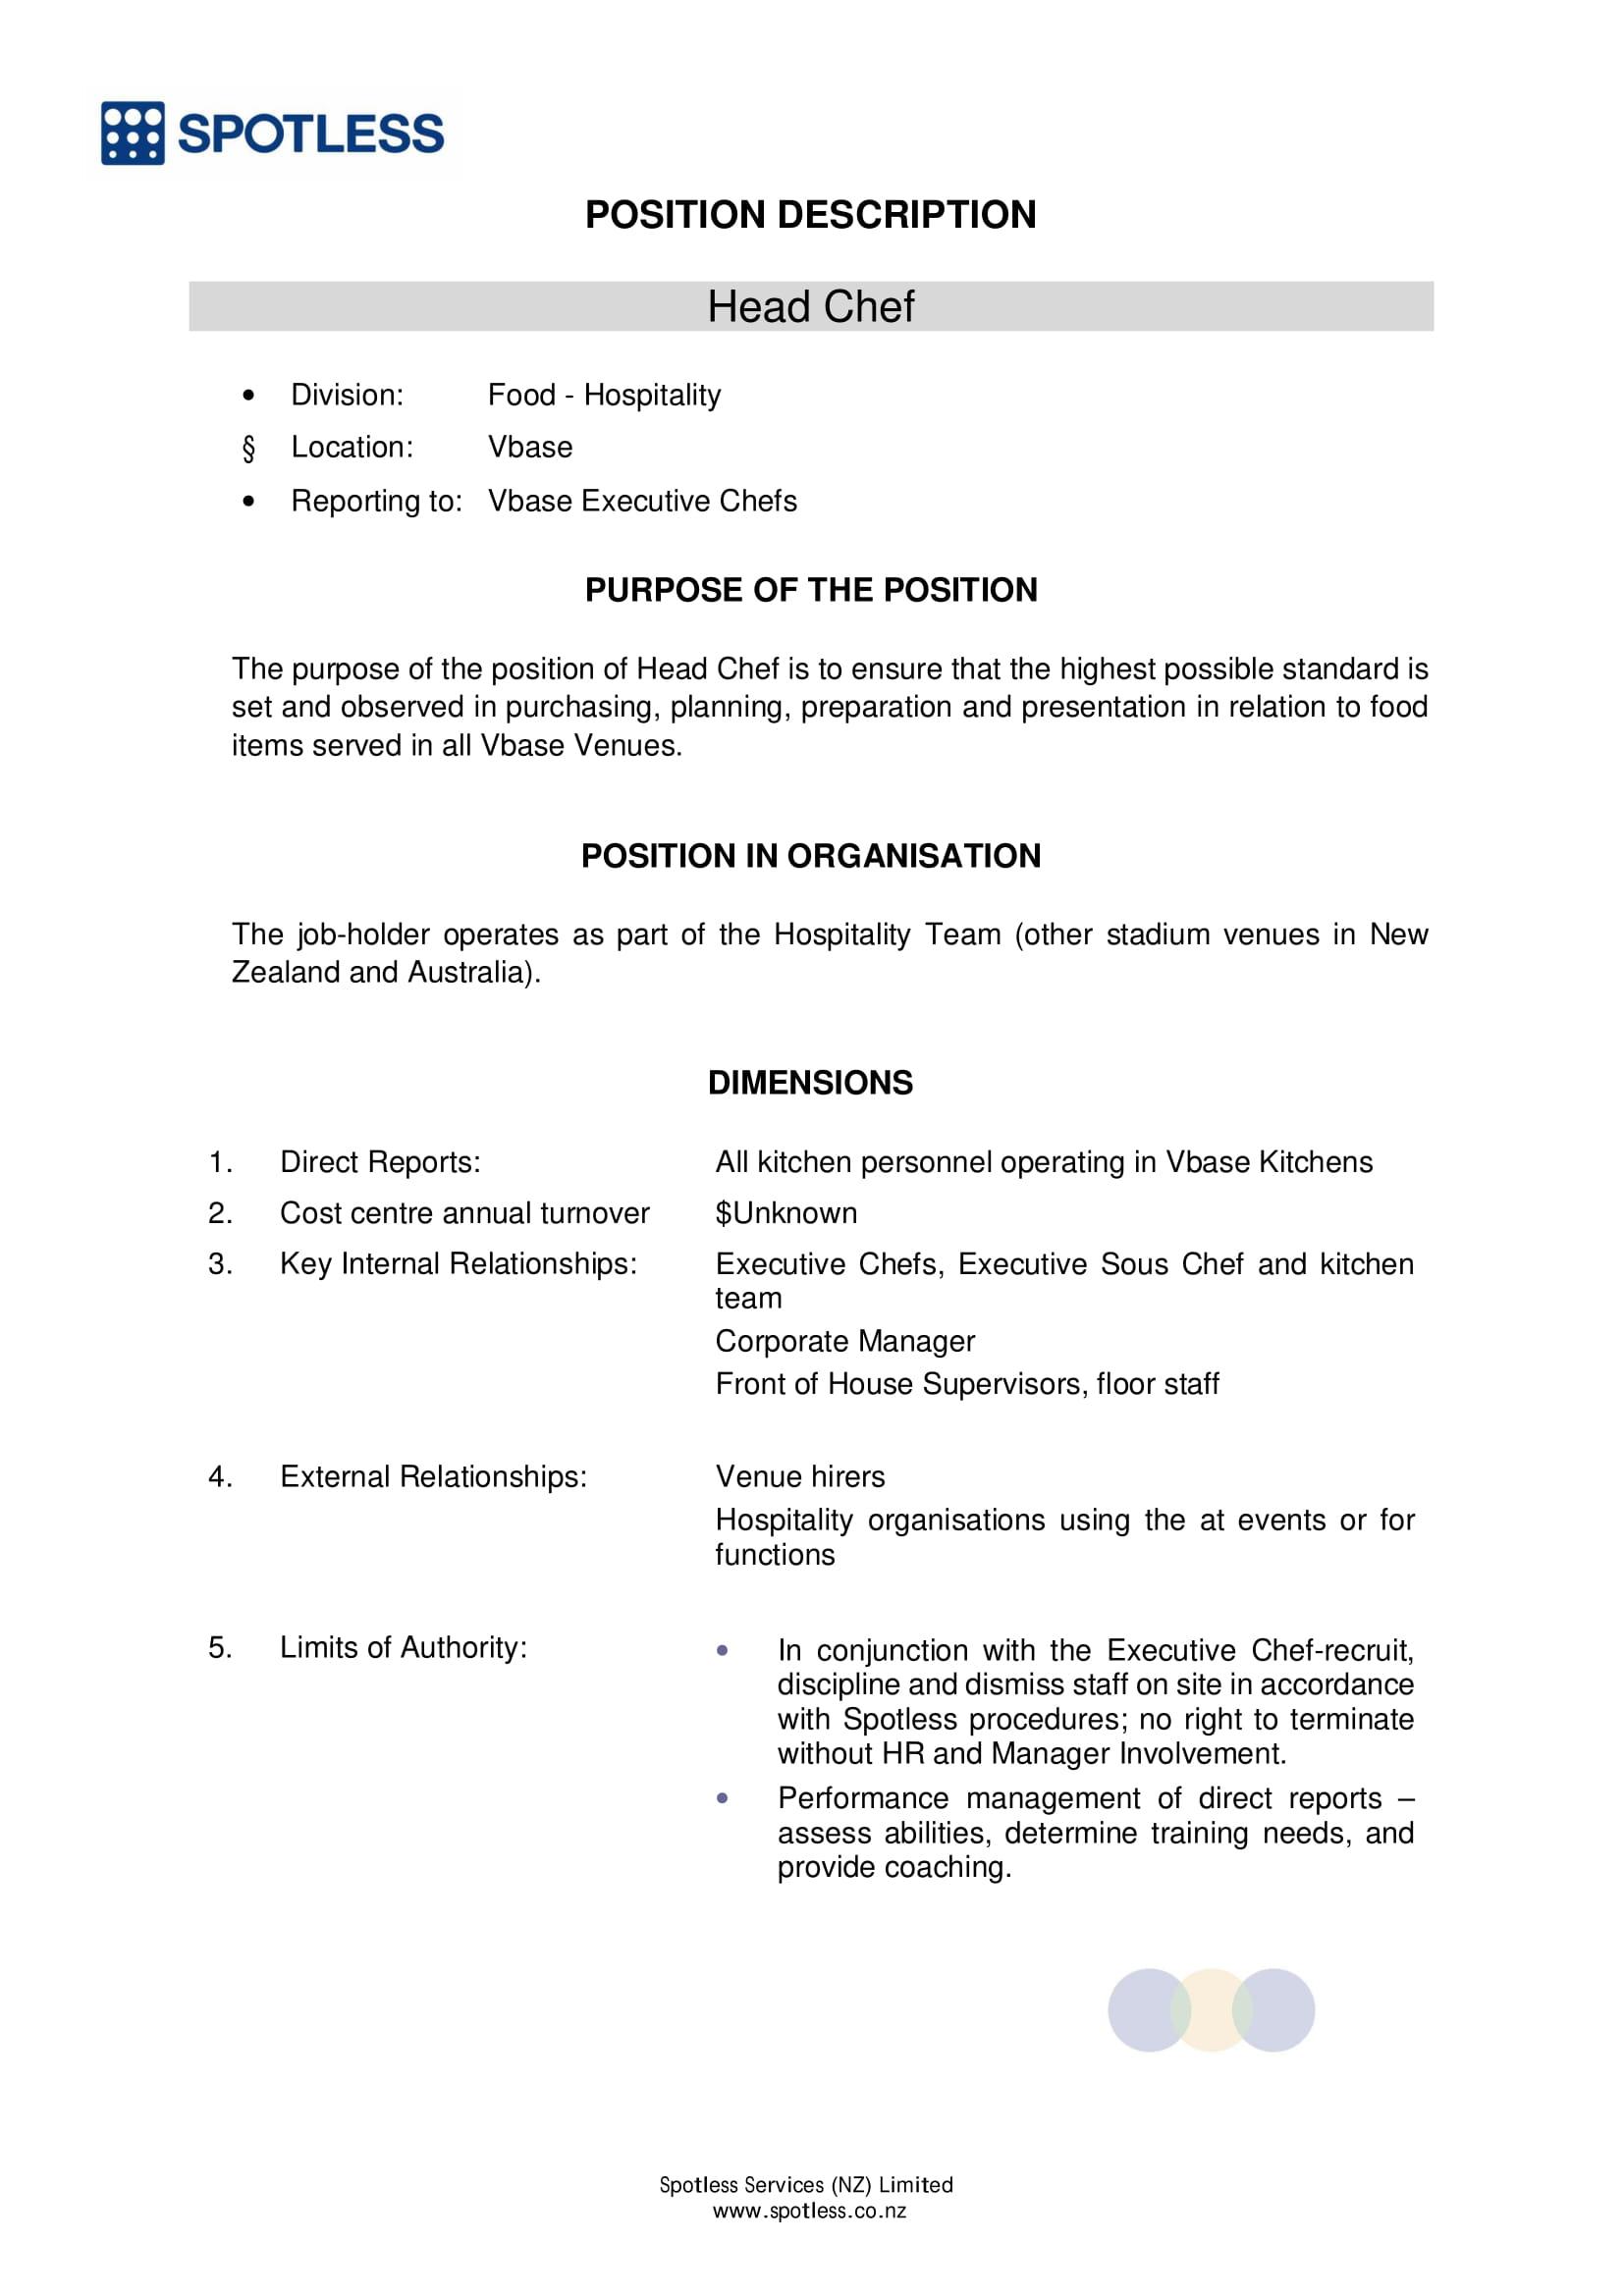 restaurant employee job request form 1